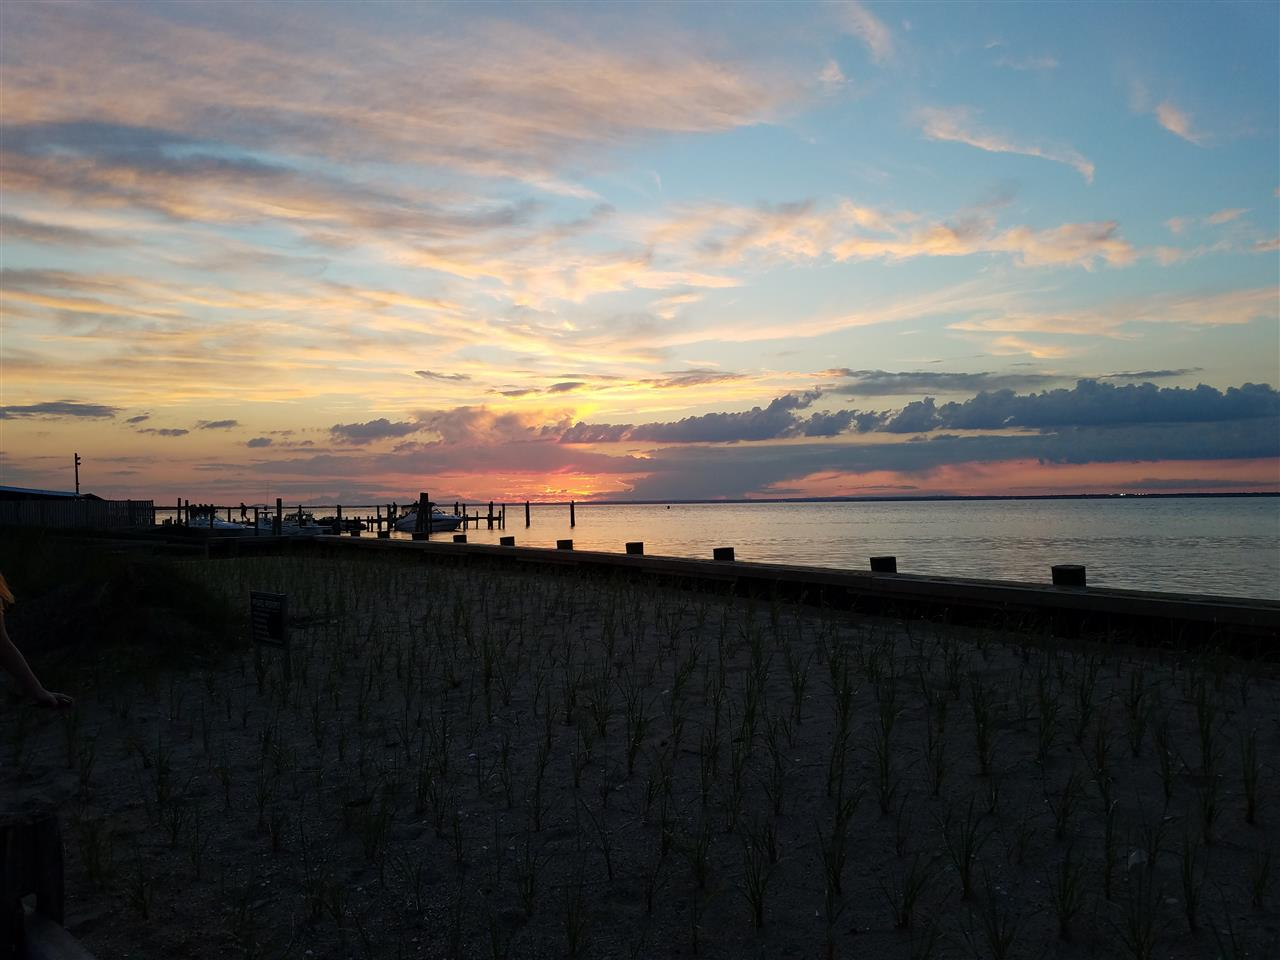 Ocean Beach Fire Island, NY